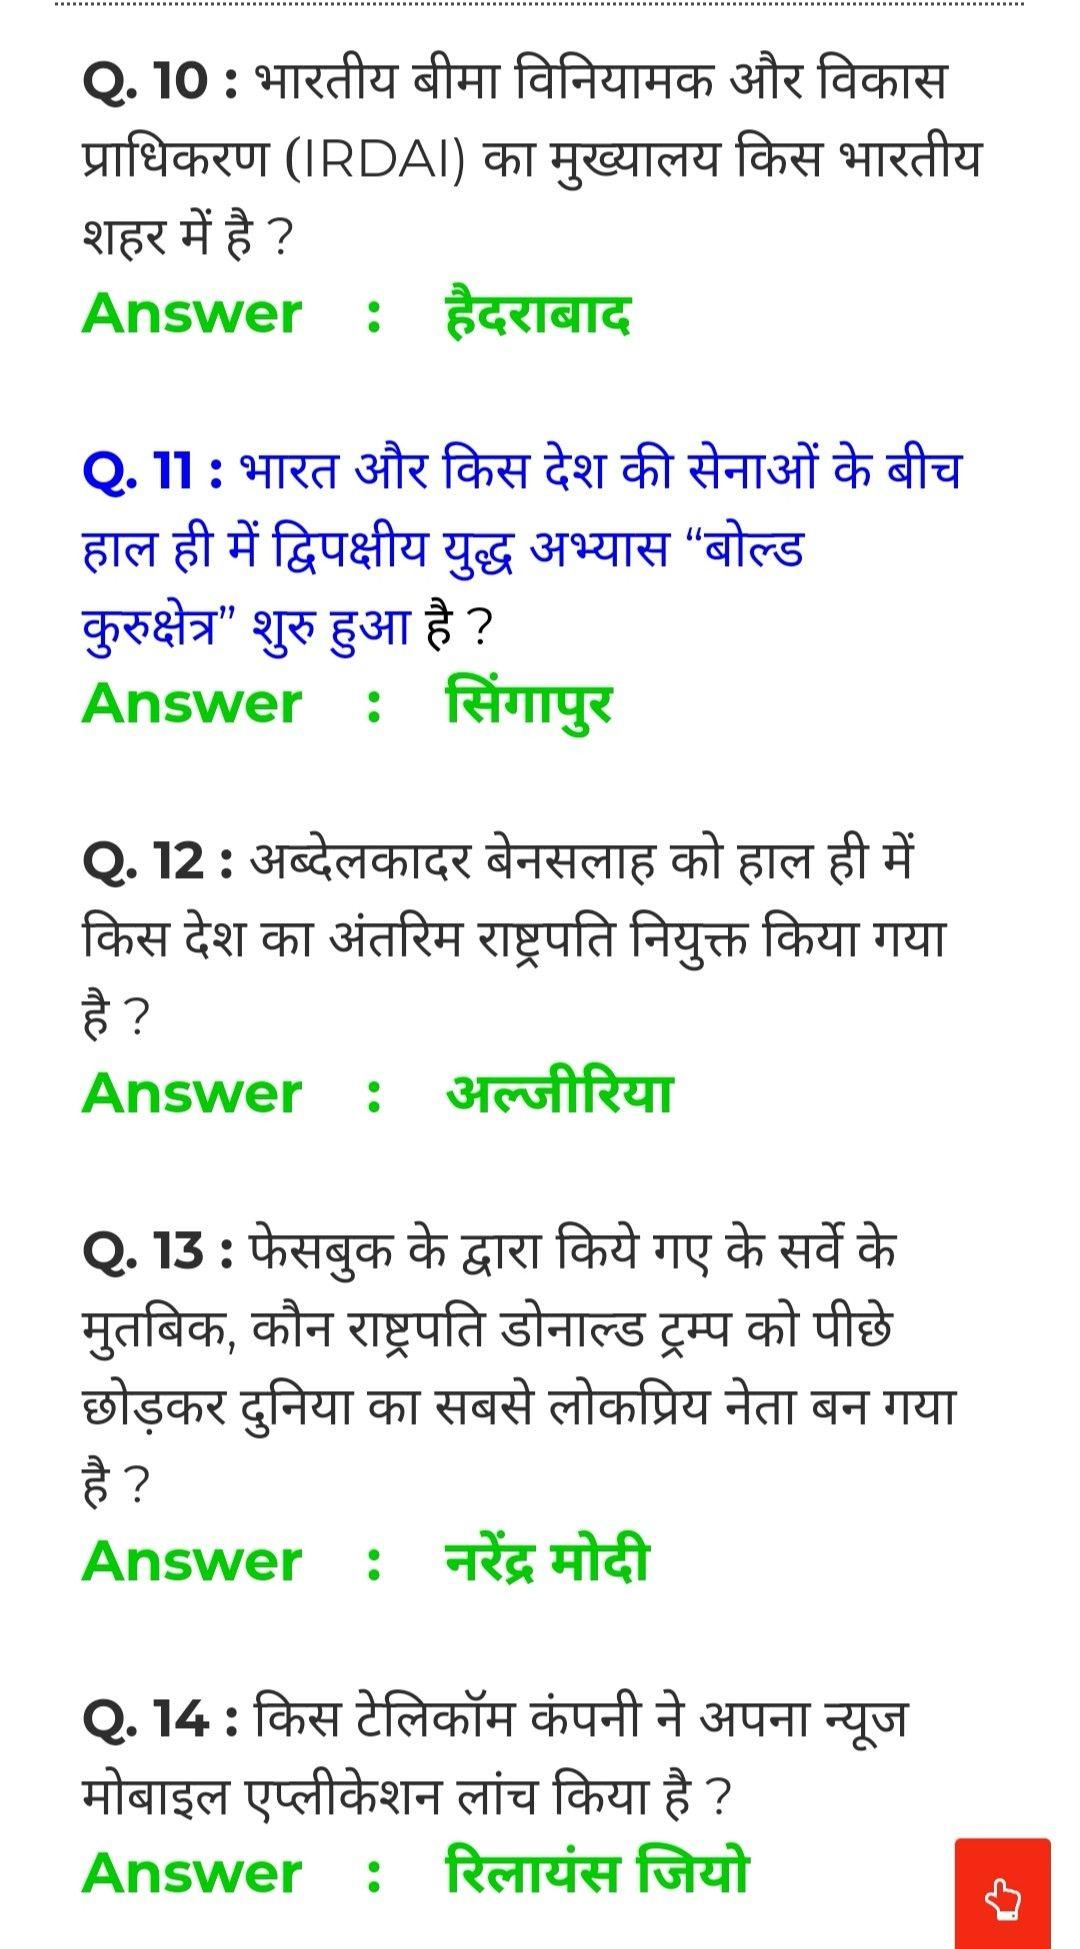 Current affairs gk questions samanya gyan pdf free download